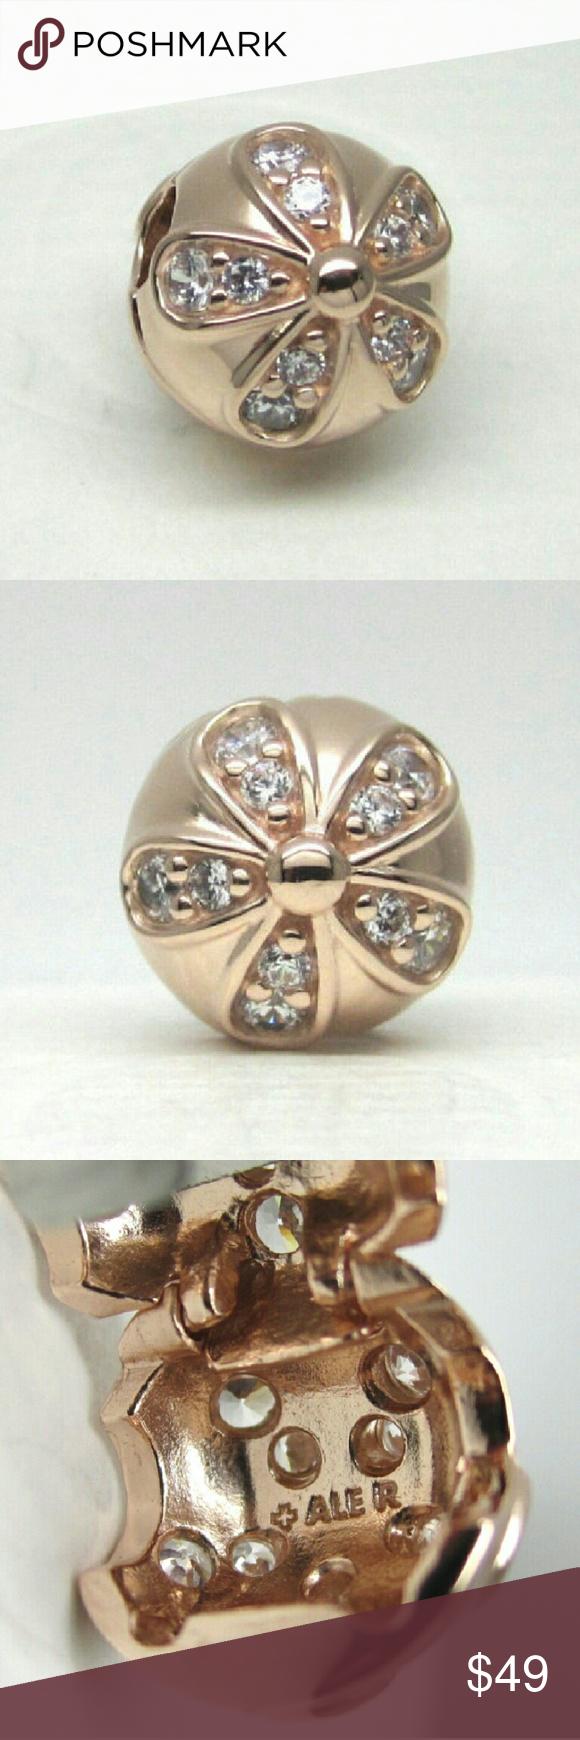 cd11bb7b5 Authentic Pandora Rose Gold Dazzling Daisies Clip New! Authentic Pandora  Rose Gold Dazzling Daisies Clip